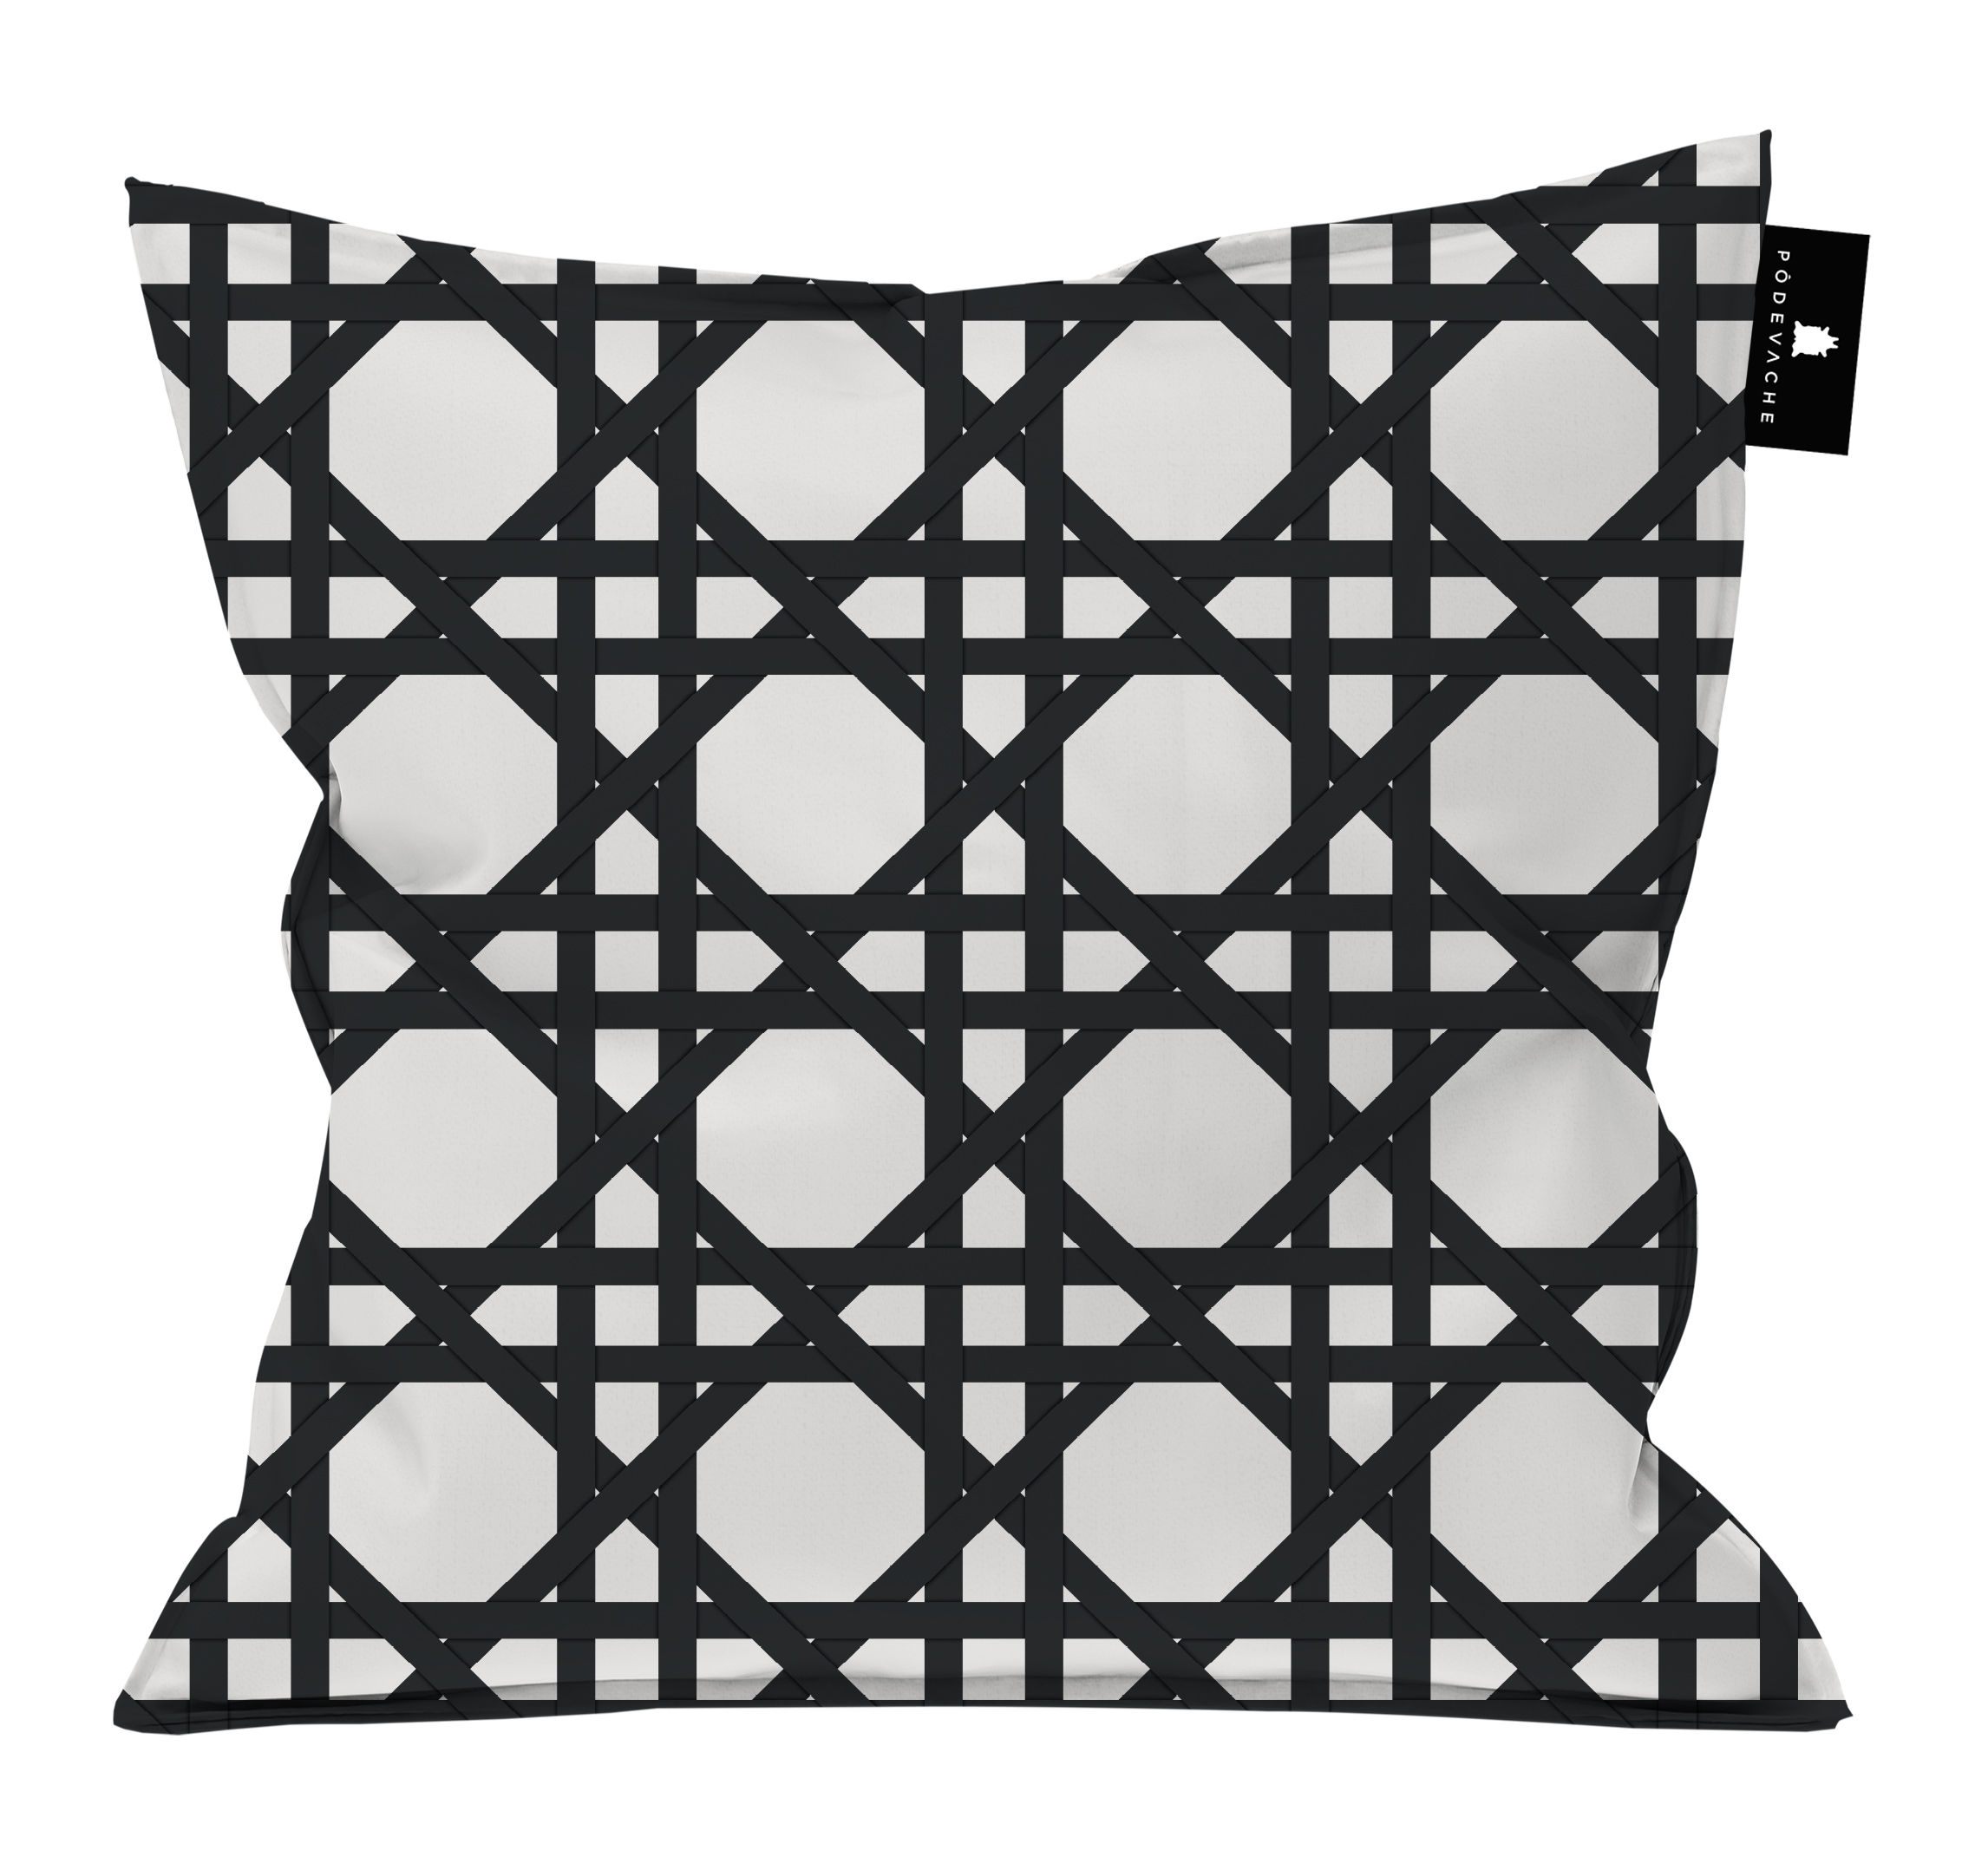 Decoration - Cushions & Poufs - Cannage Outdoor cushion - / 55 x 55 cm by PÔDEVACHE - Black -  Micro-billes EPS, Polyester